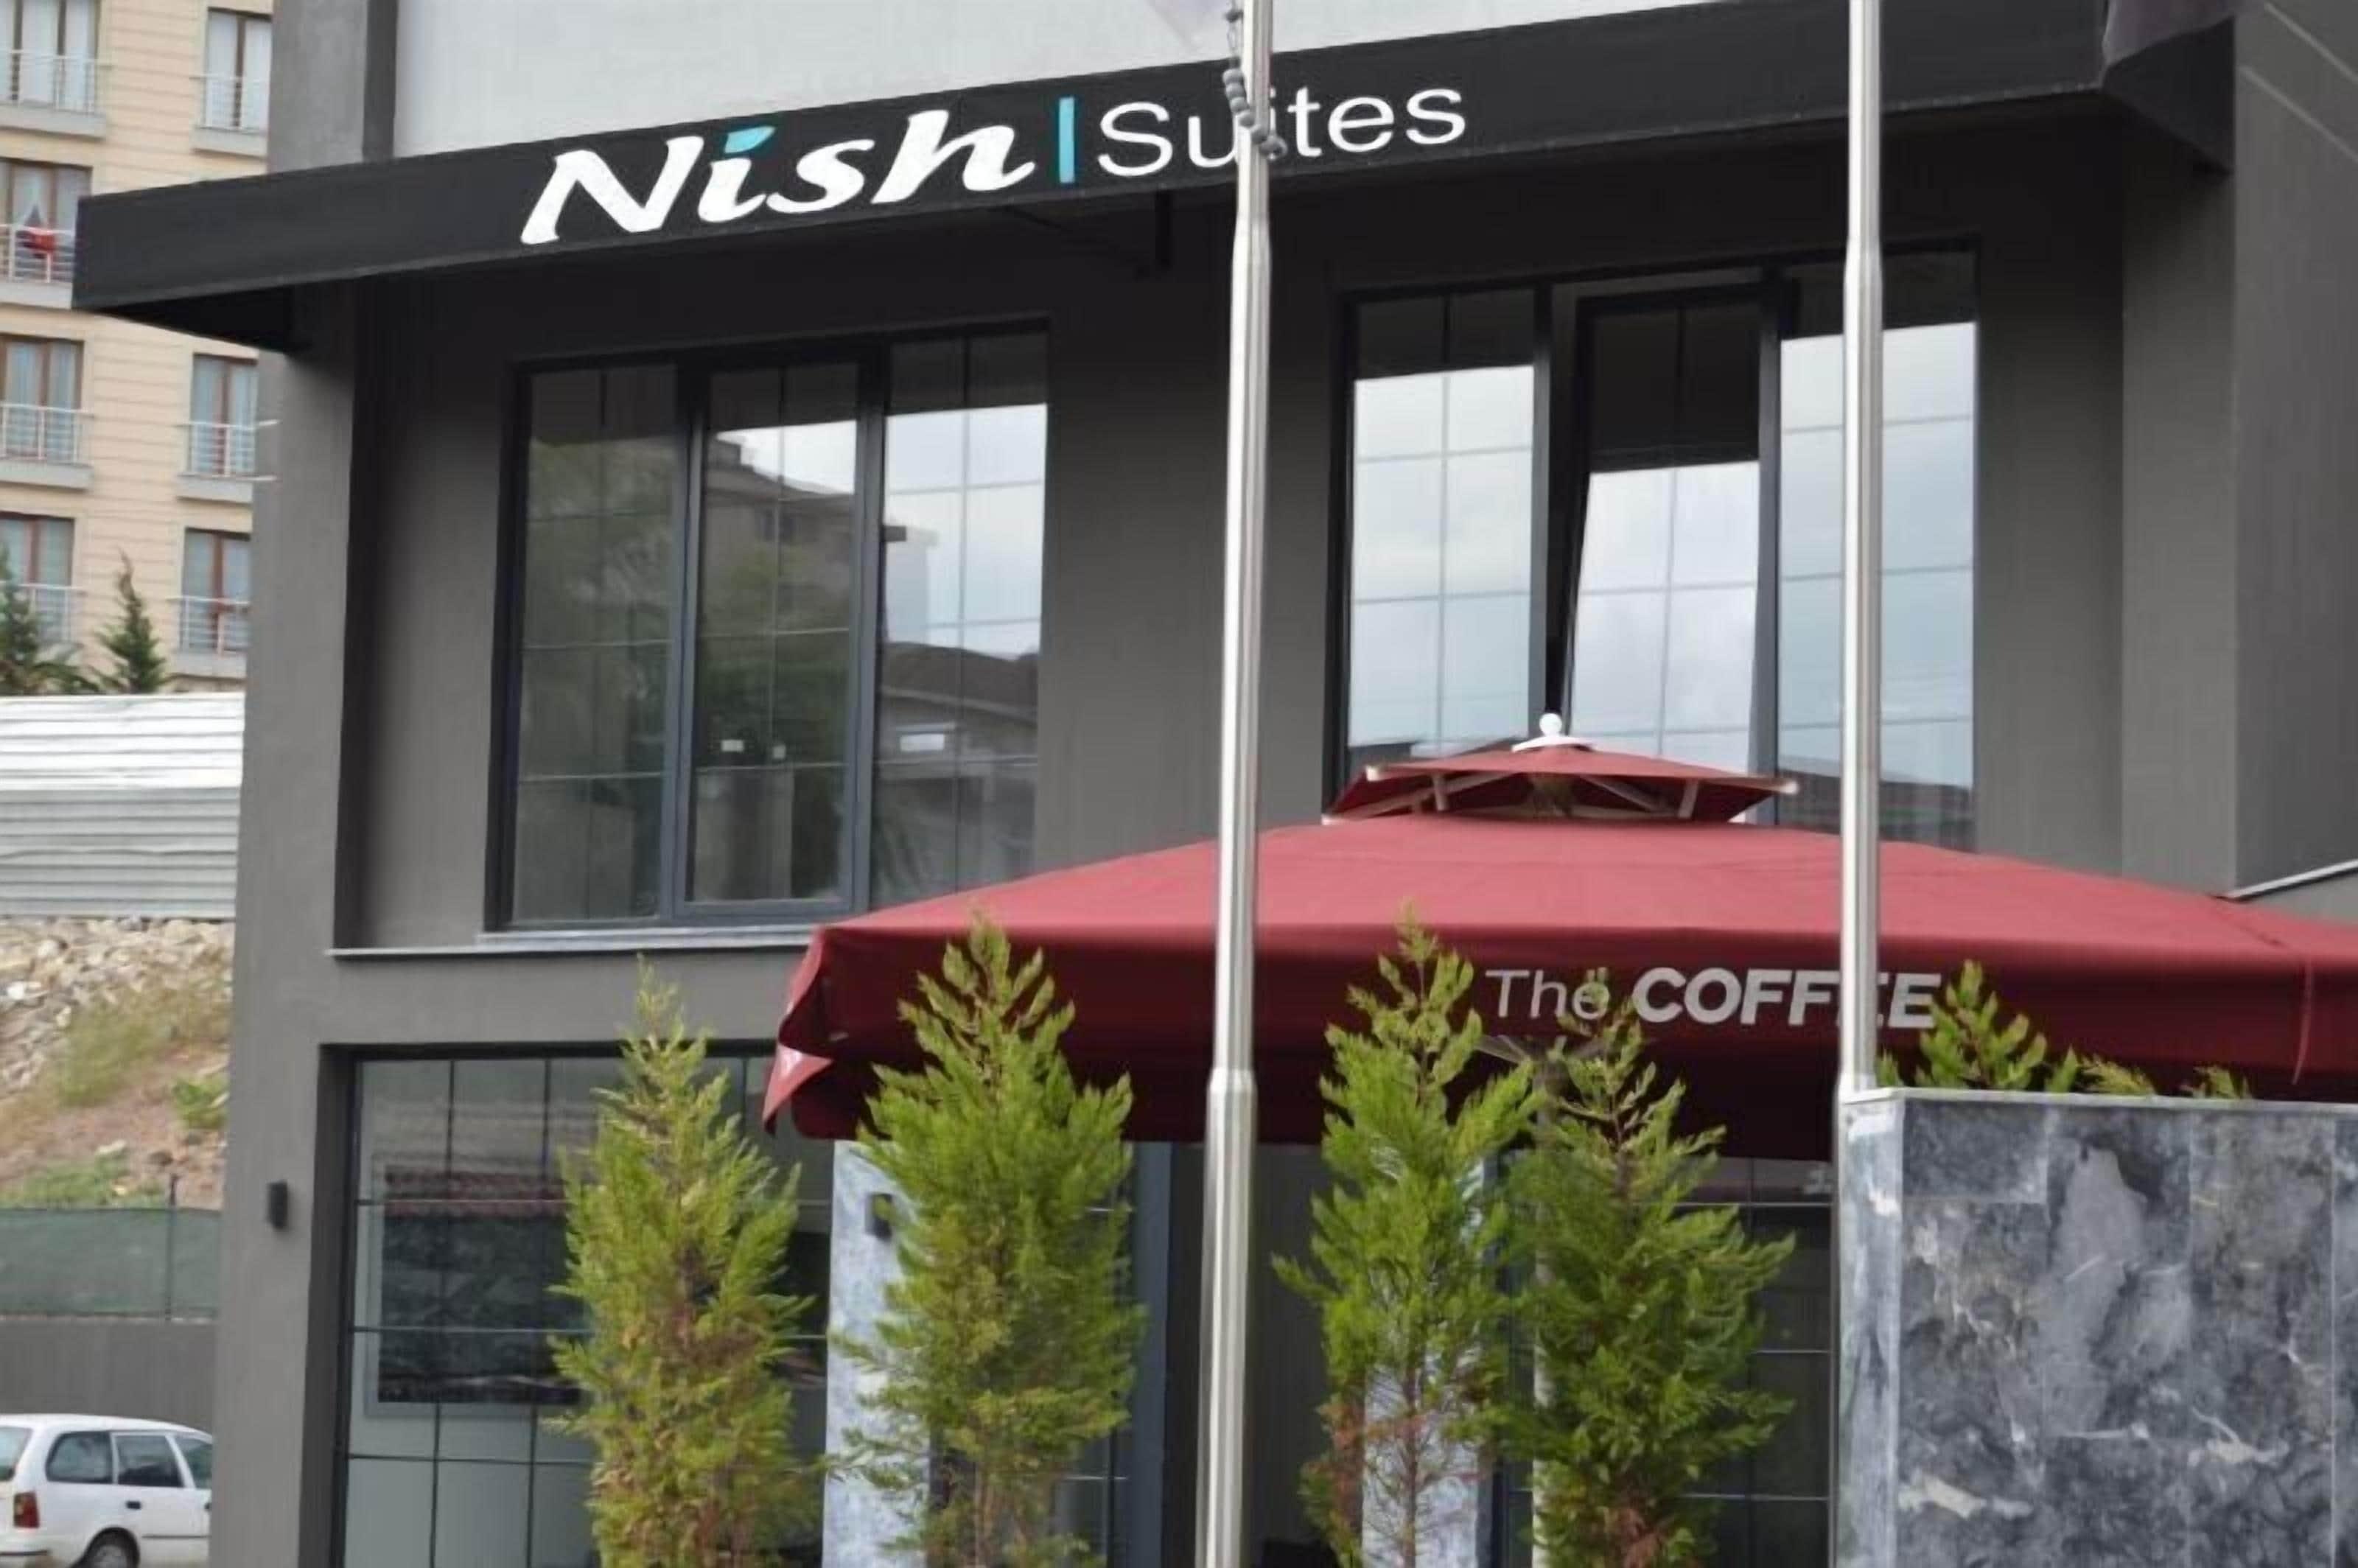 Nish Suite Atasehir